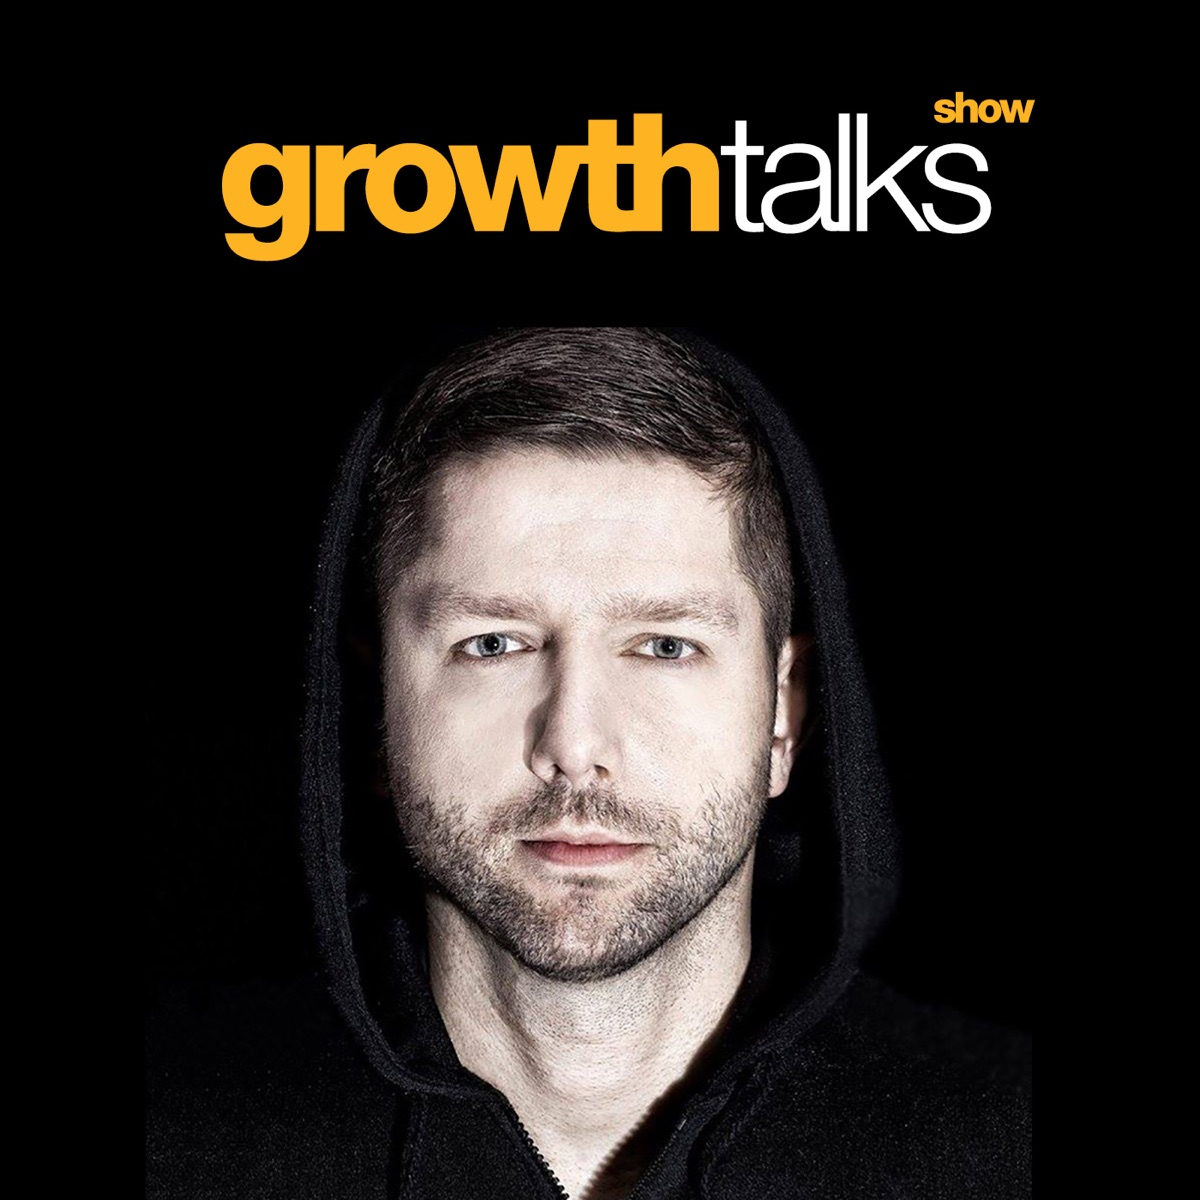 Growth Talks by Michal Sadowski